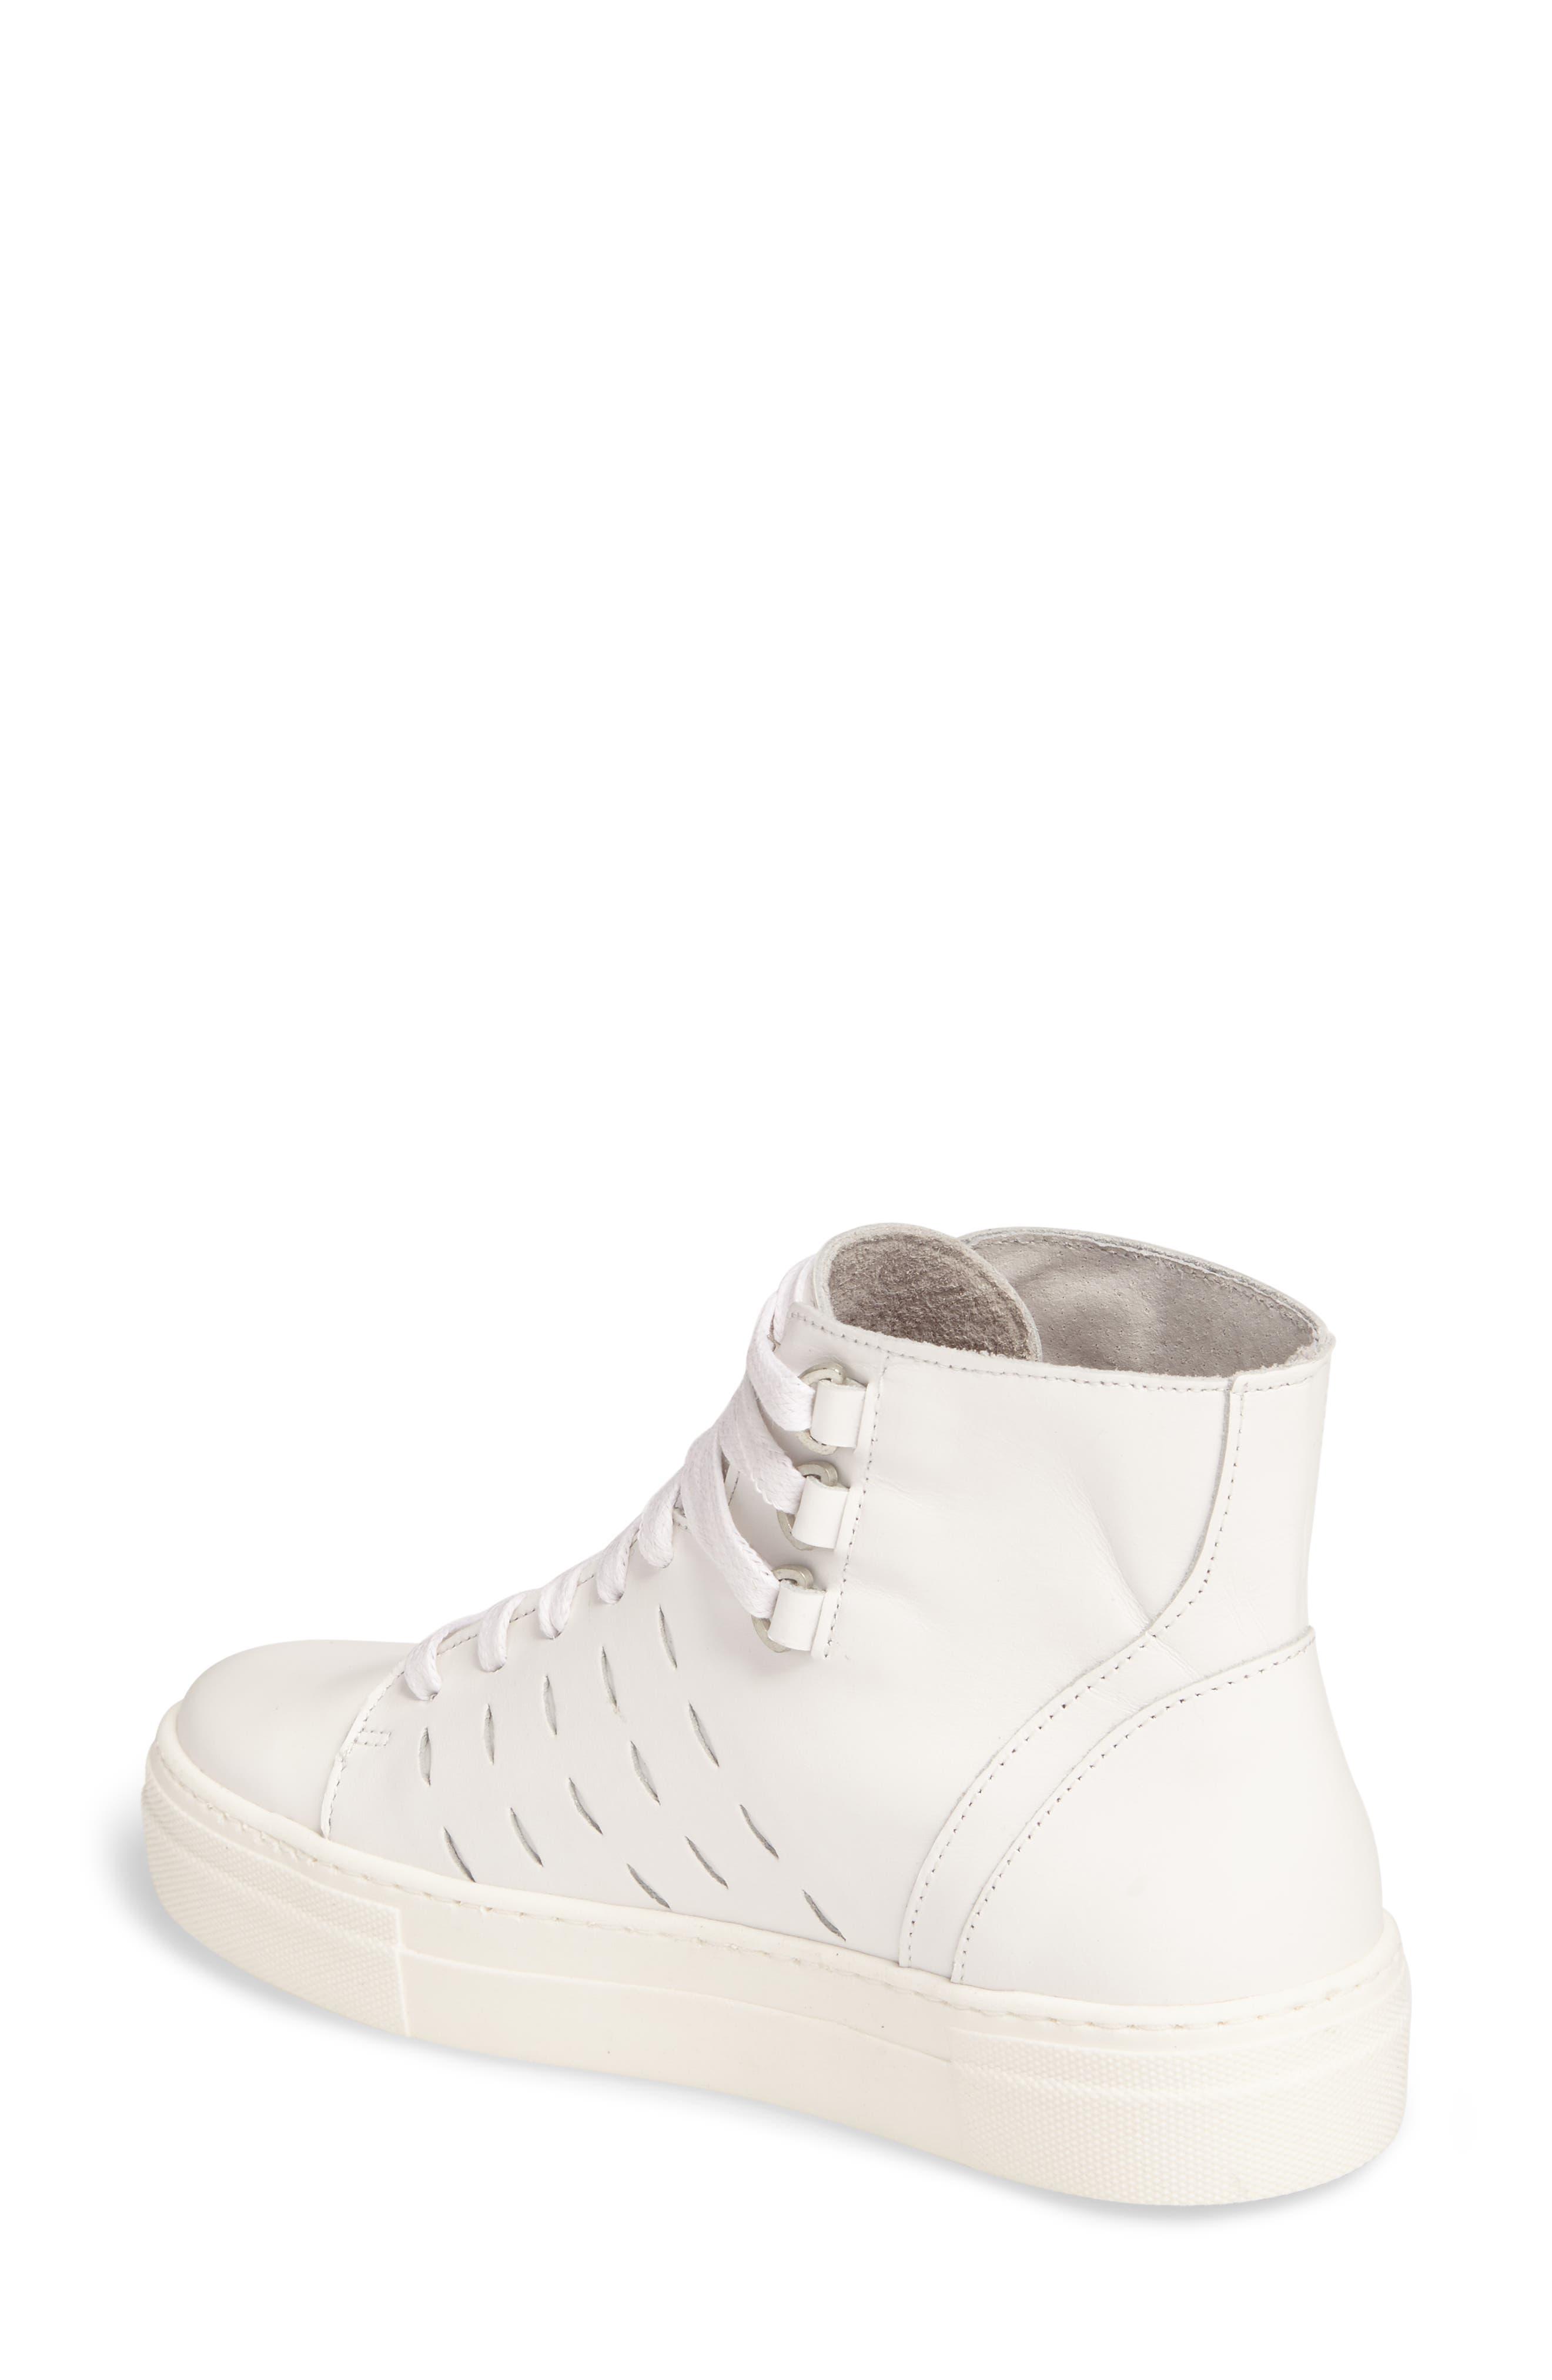 Alternate Image 2  - K-Swiss Modern High Top Sneaker (Women)